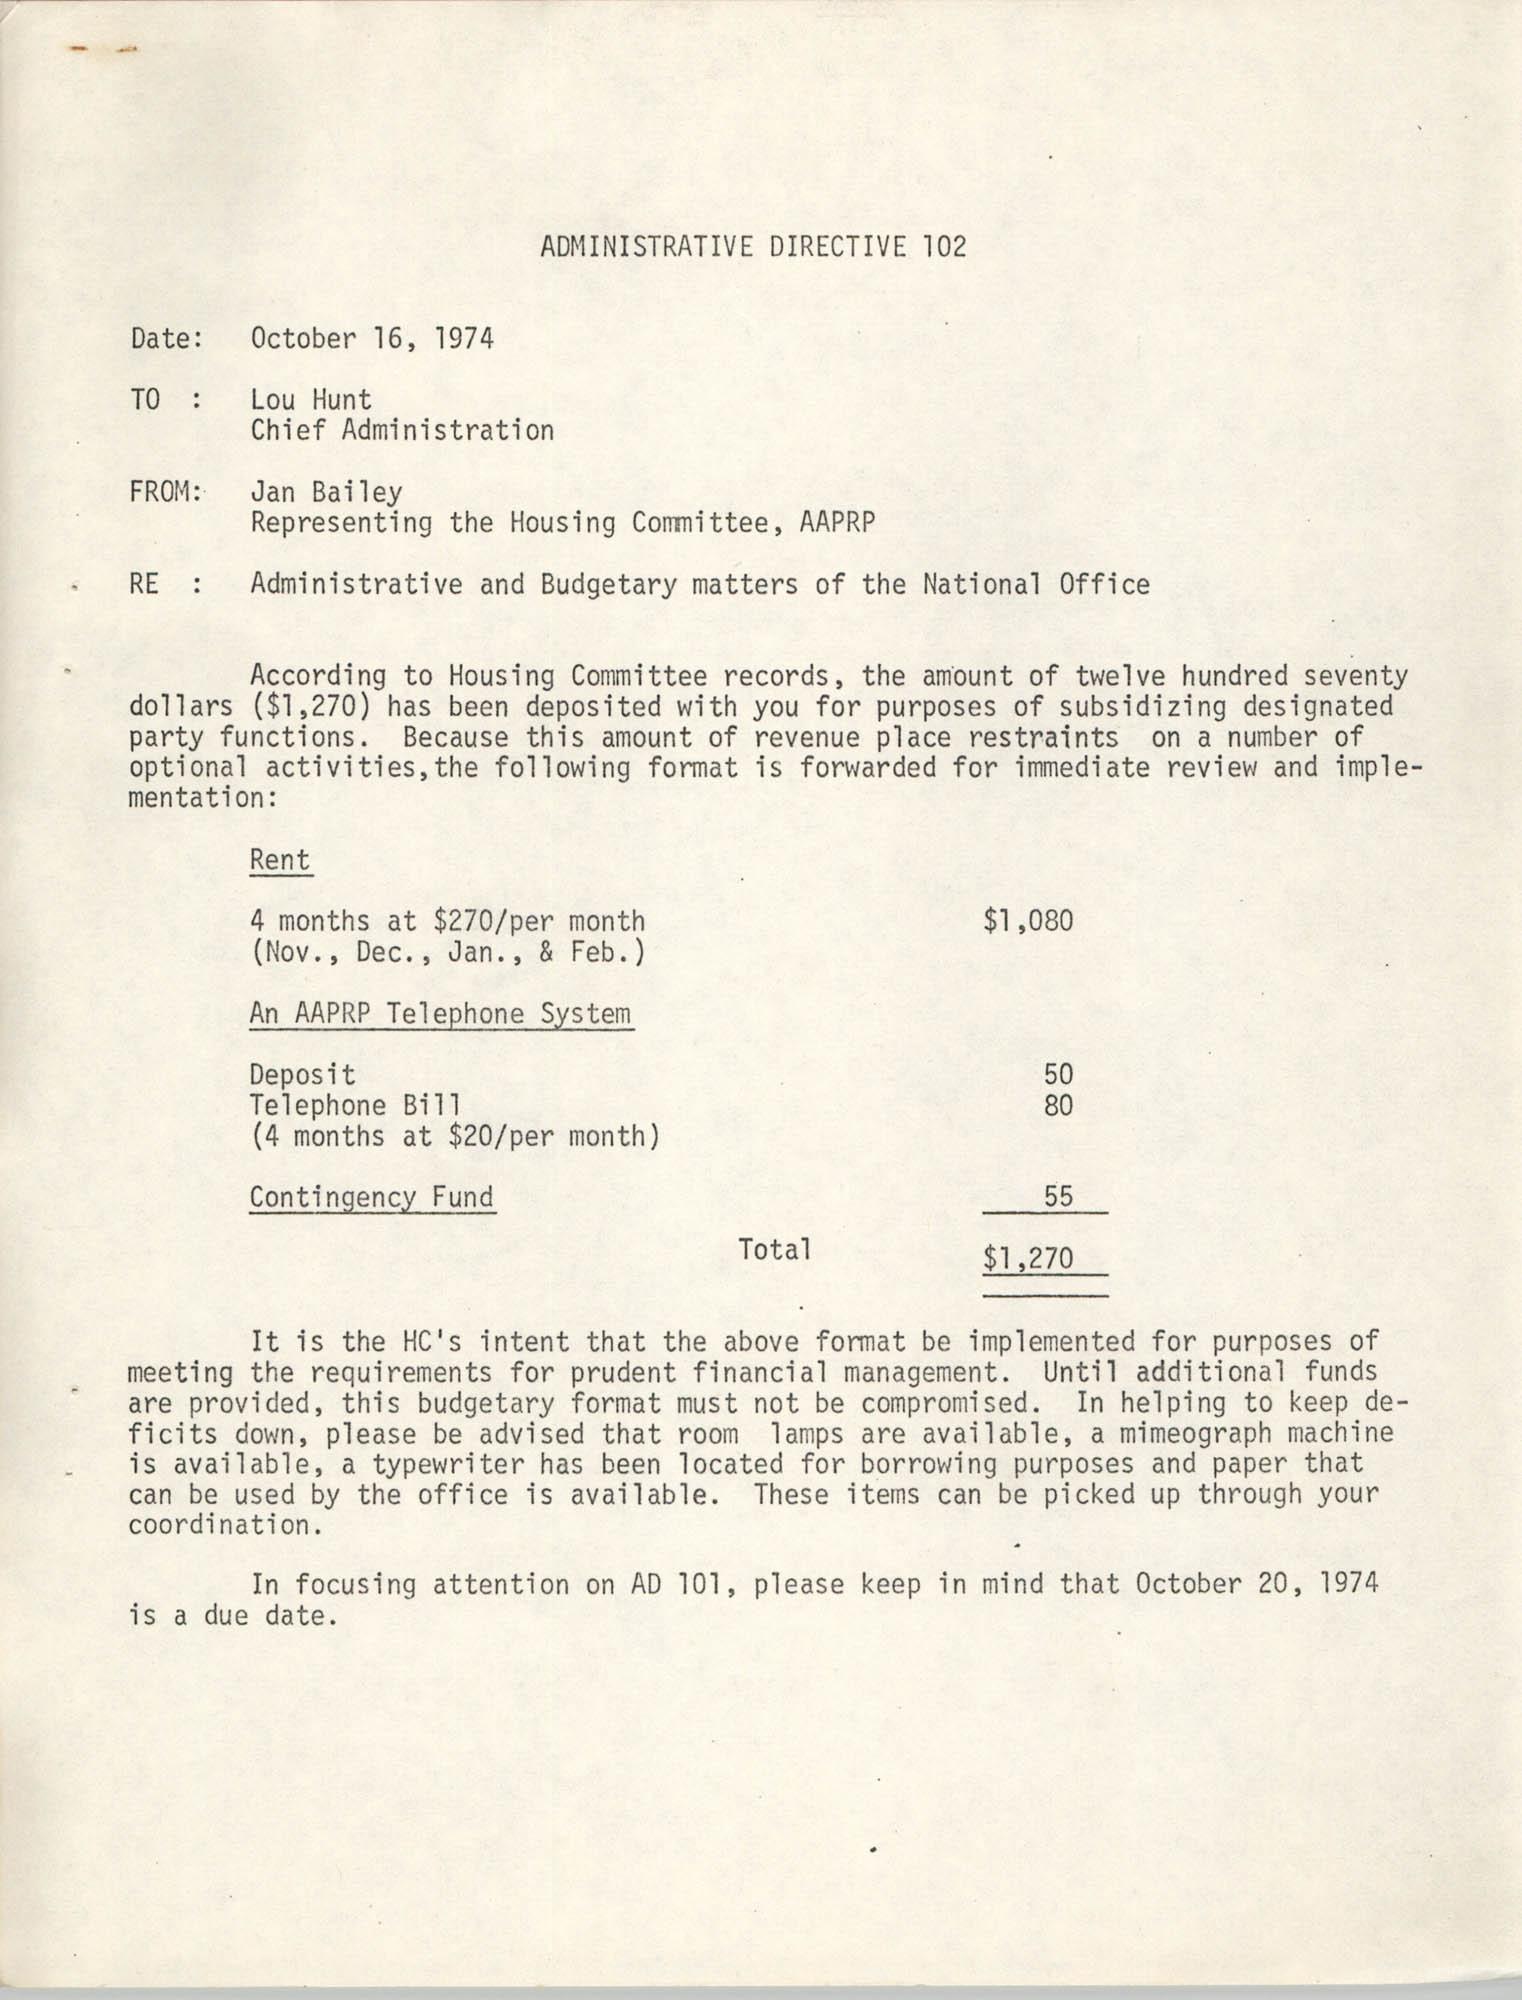 Administrative Directive 102 Memorandum, October 16, 1974